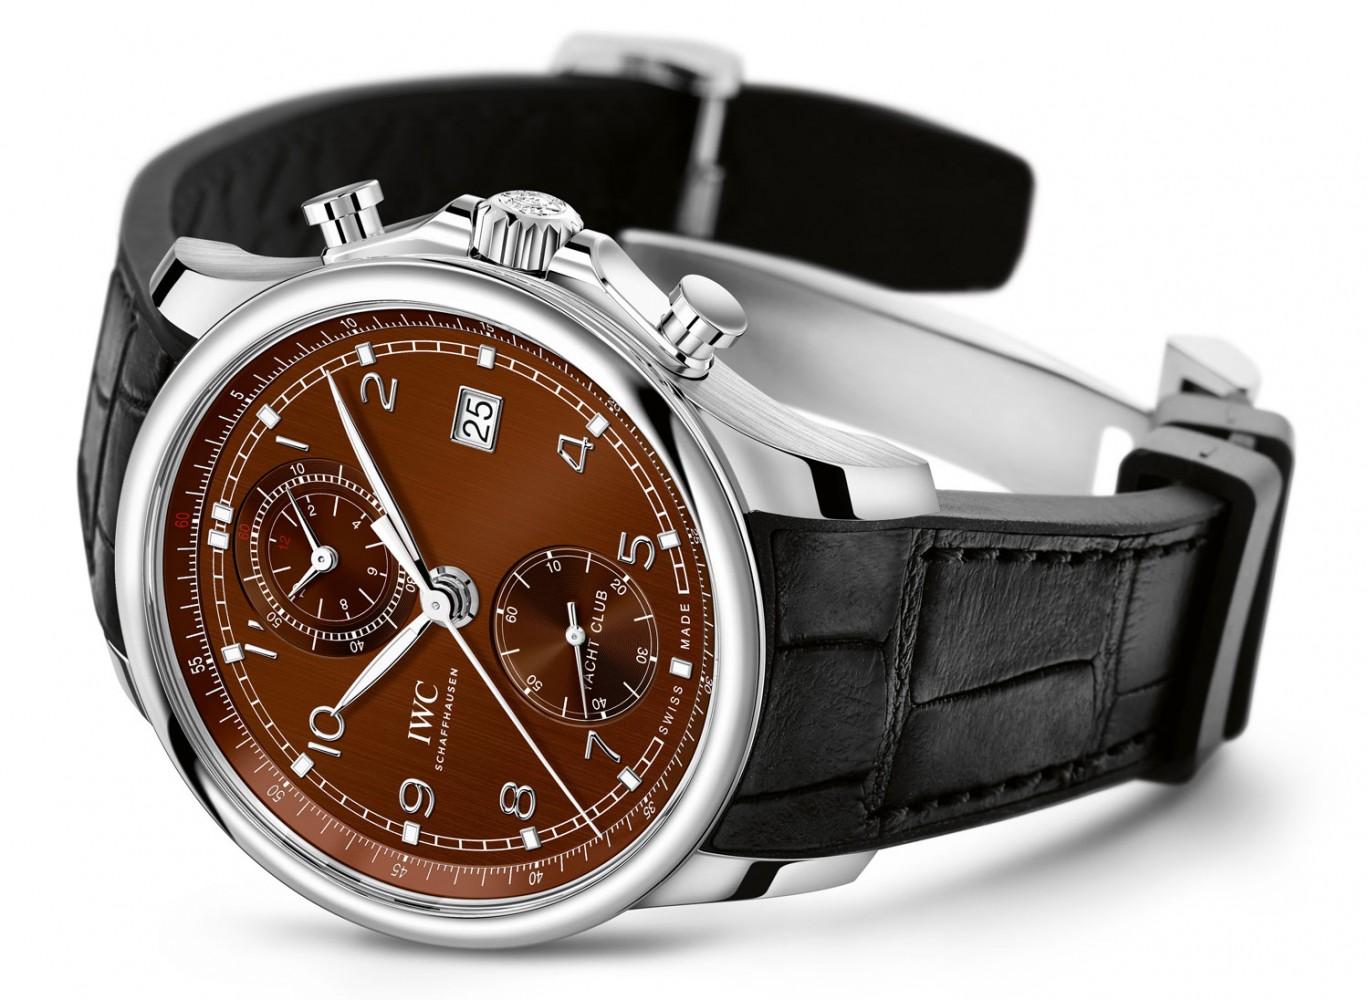 IWC Portugieser Yacht Club Chronograph watch replica